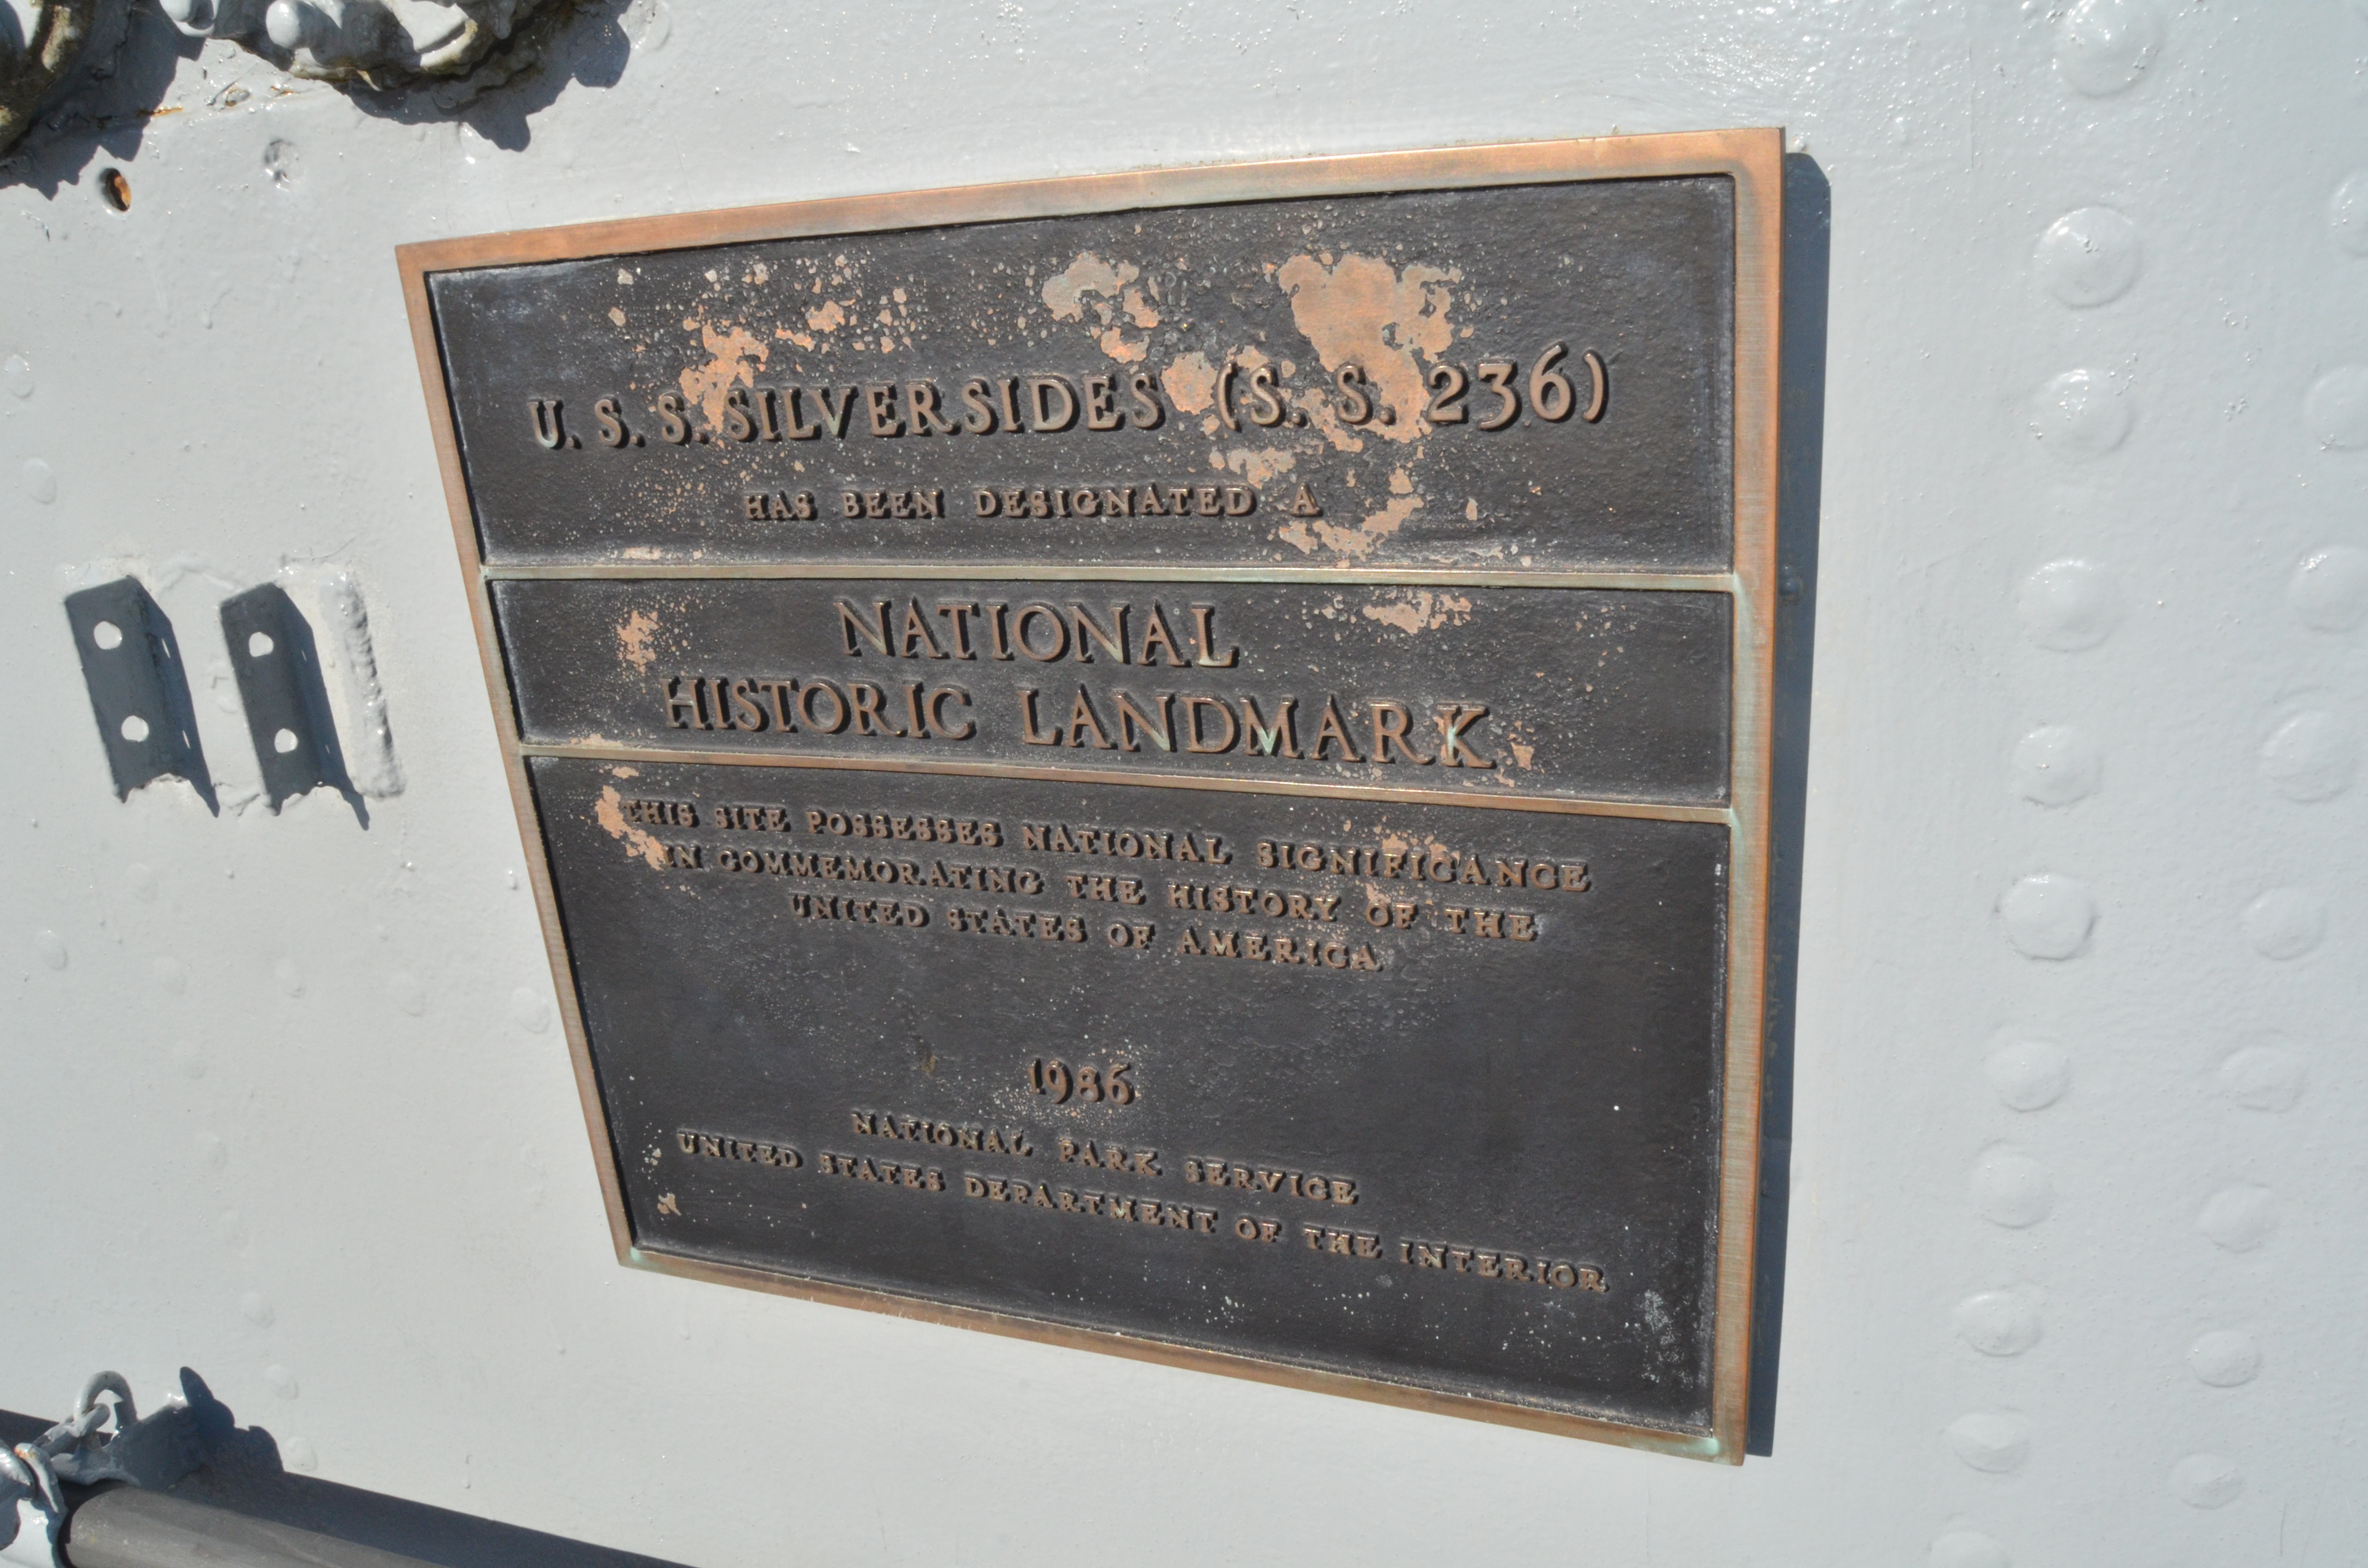 USS Silversides Submarine Museum Historical Landmark Plaque